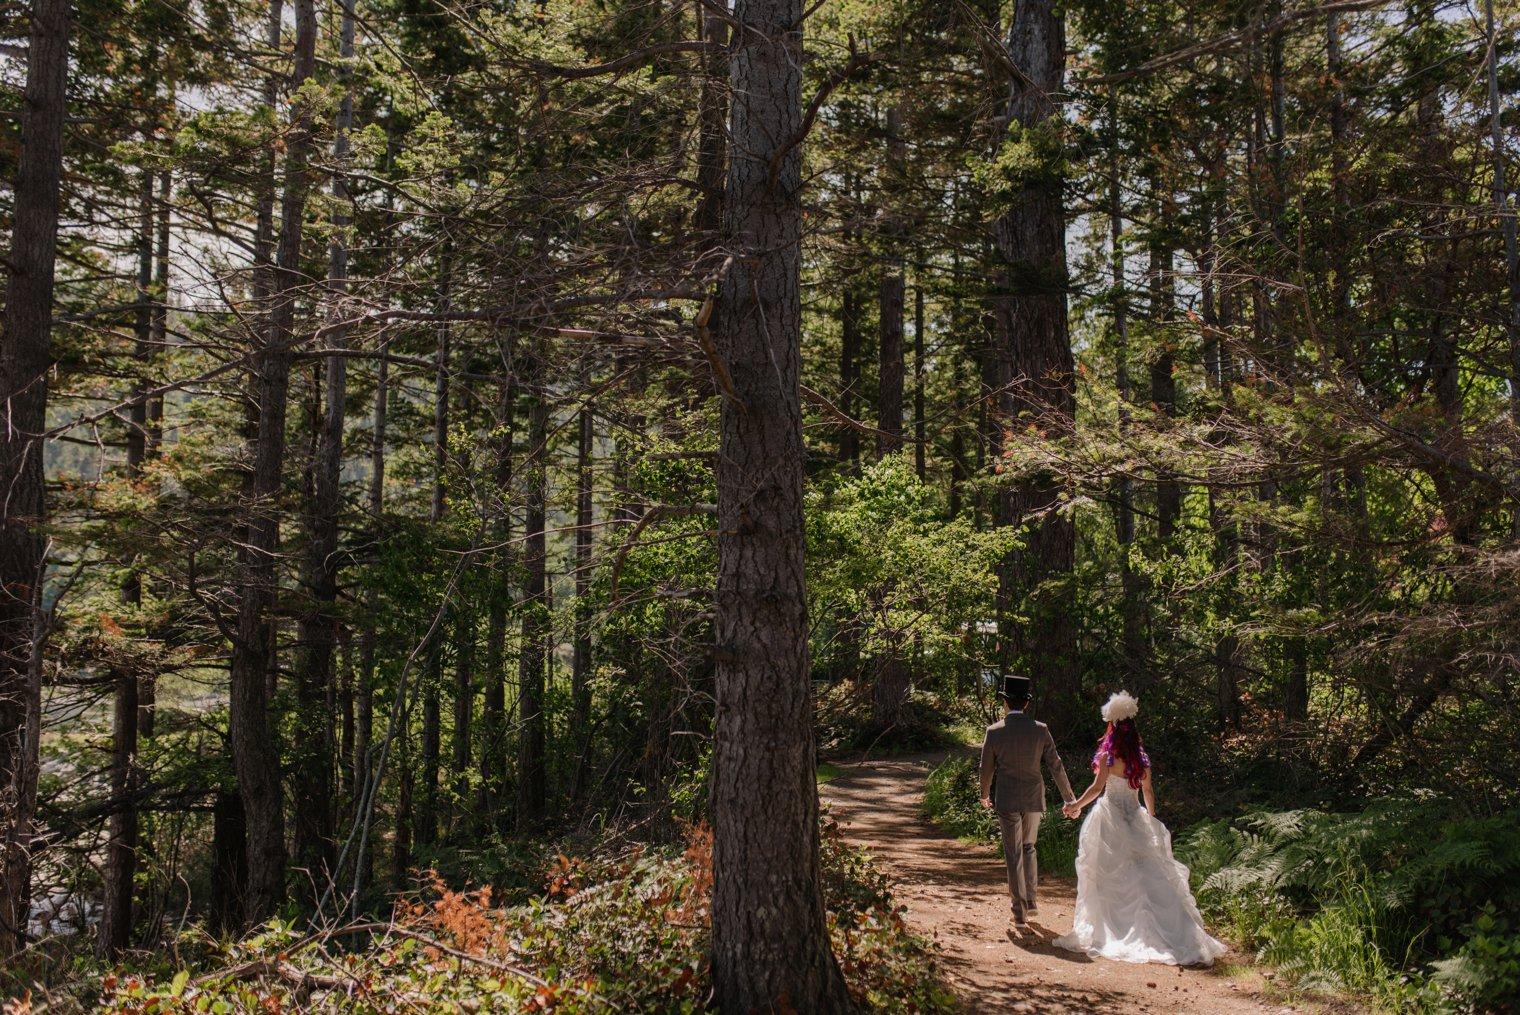 bowen island forest wedding photos